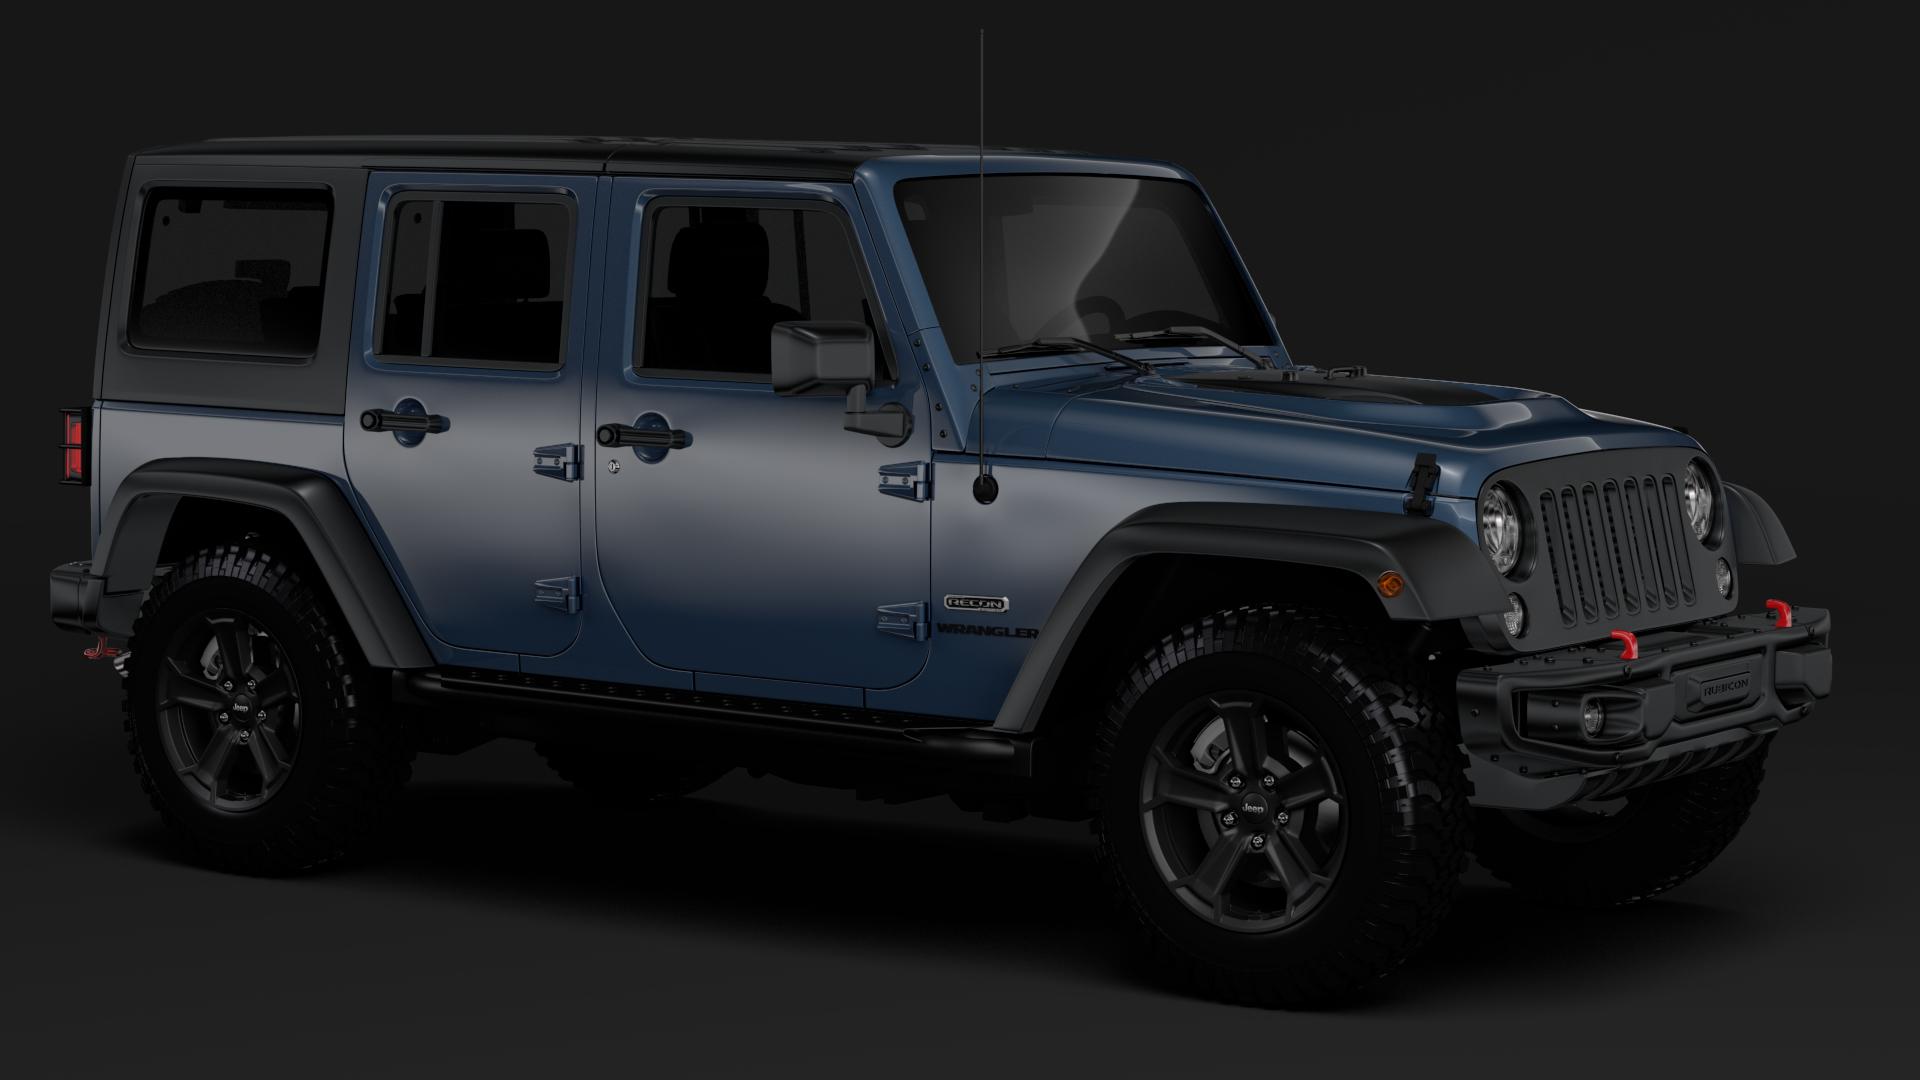 jeep wrangler unlimited rubicon recon jk 2017 3d model max fbx c4d lwo ma mb hrc xsi obj 277000